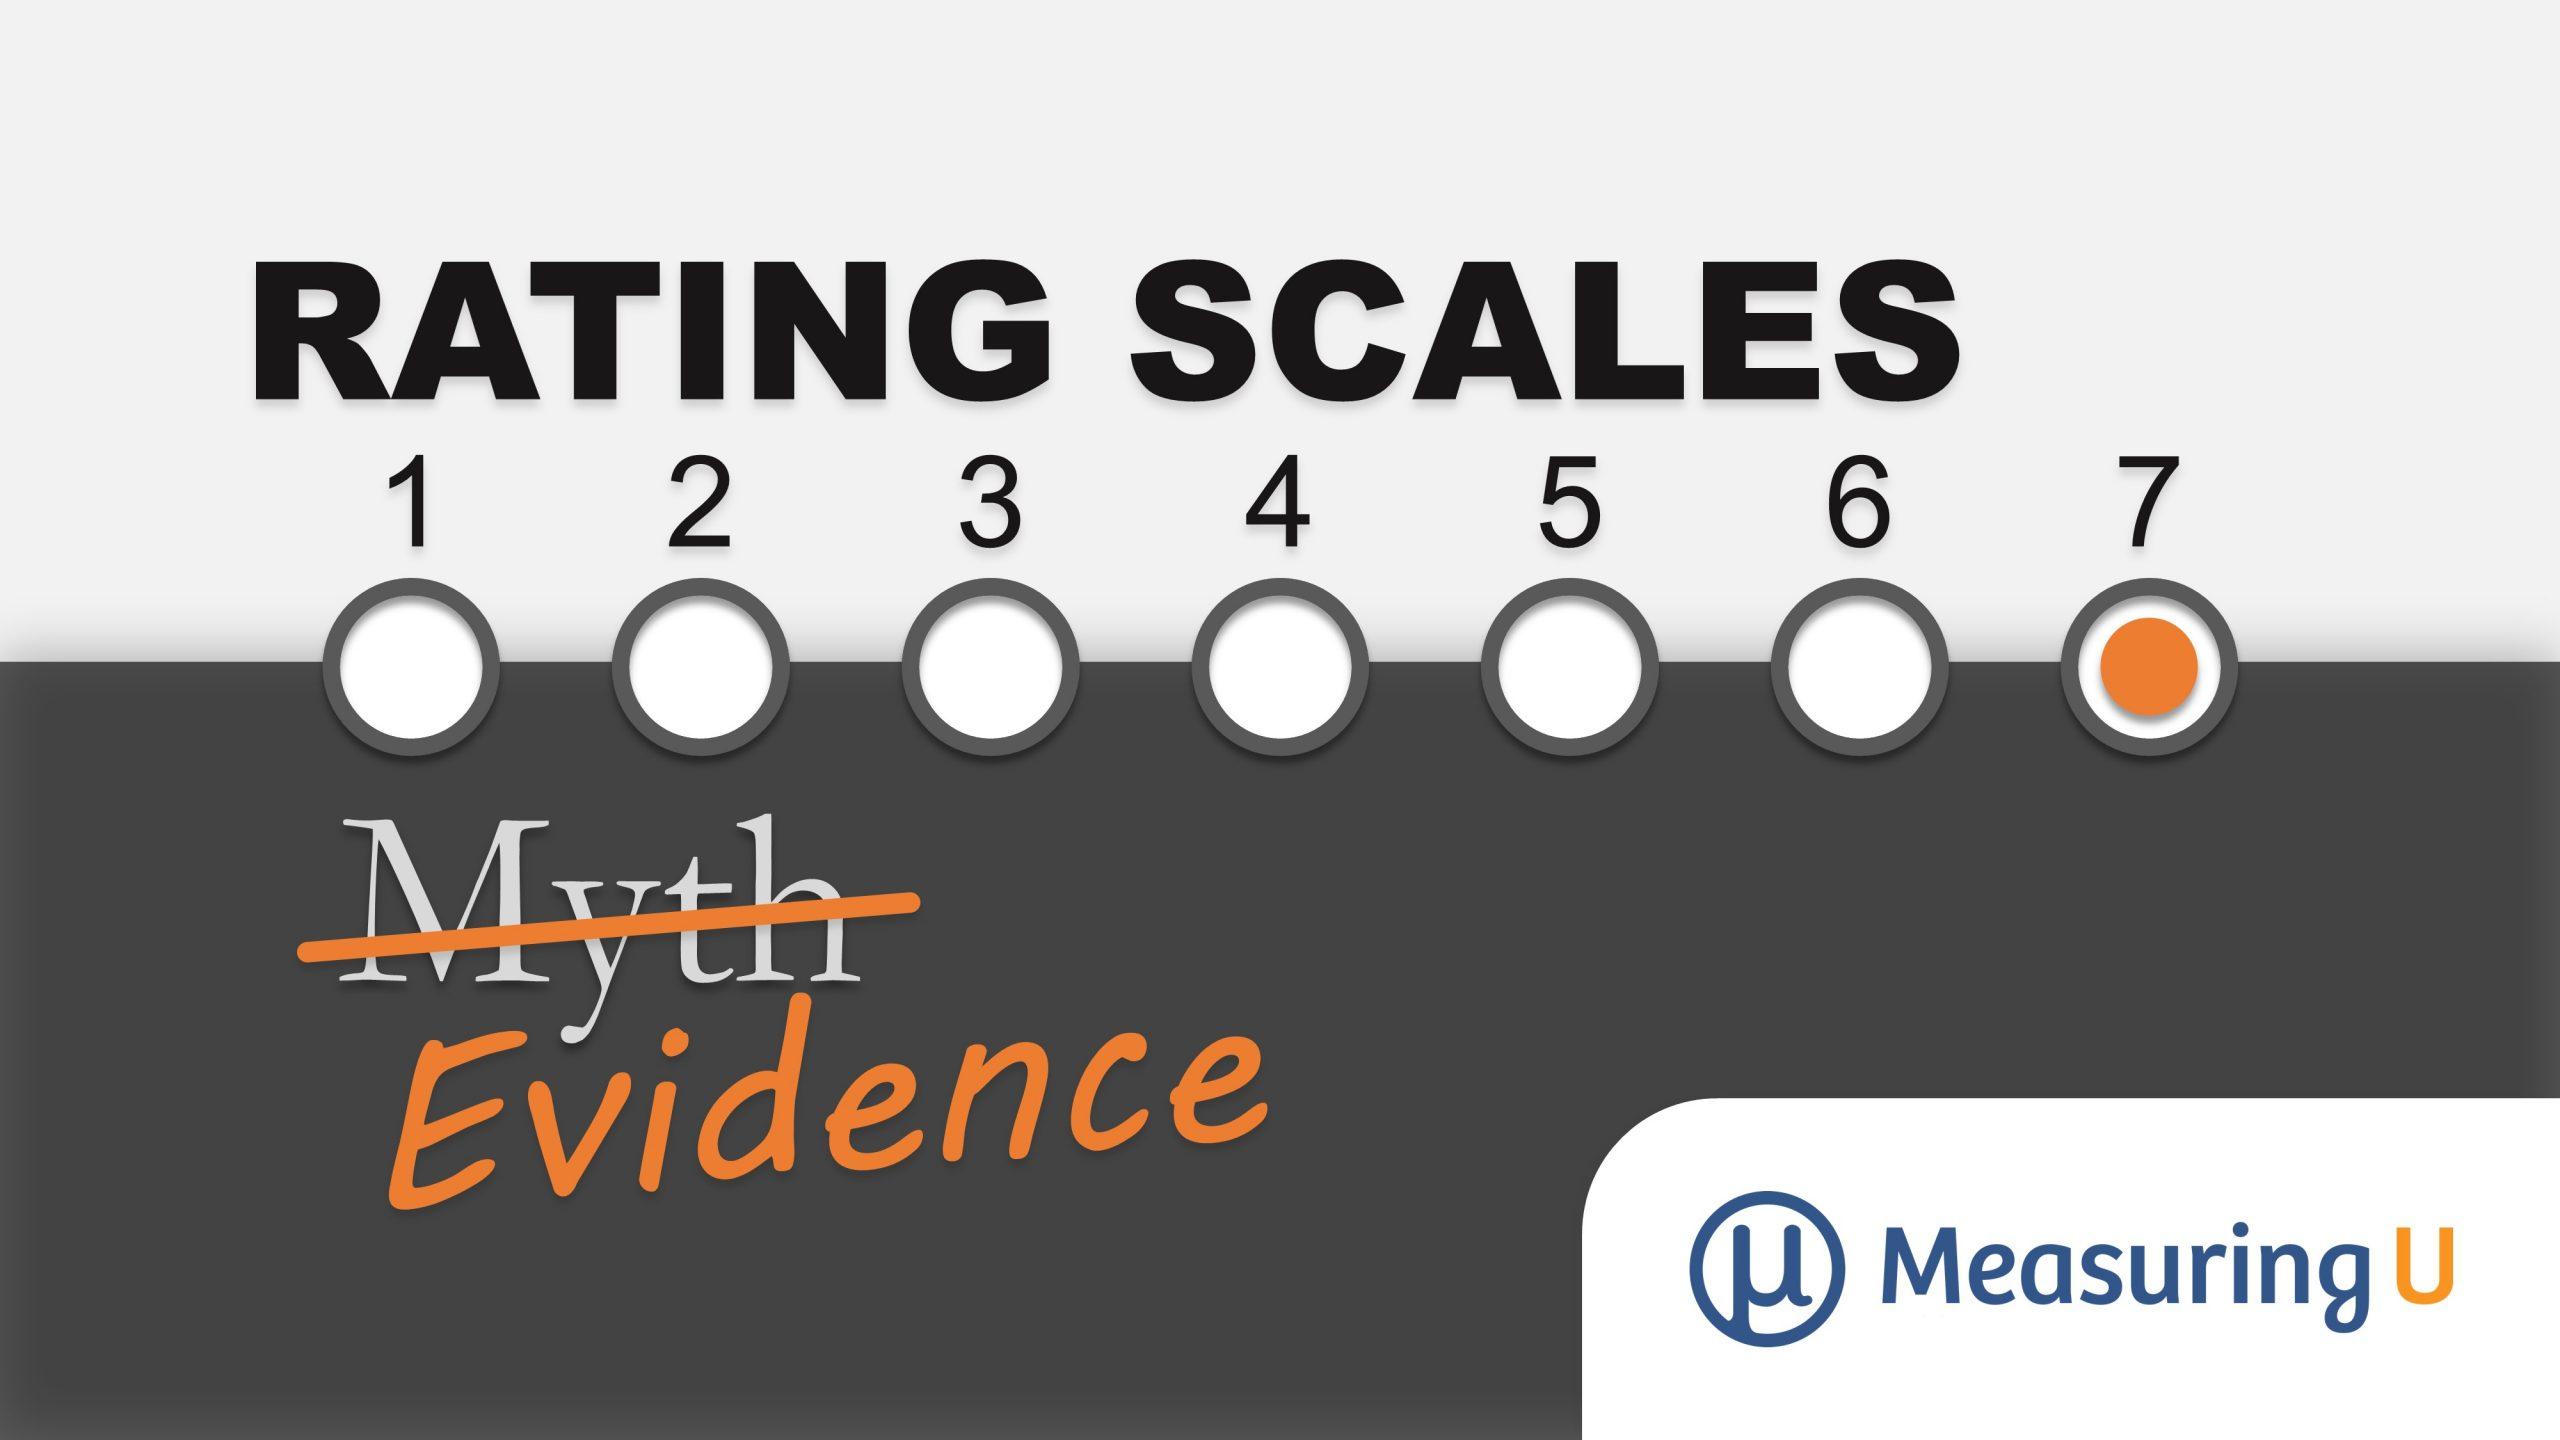 Rating Scales: Myth vs. Evidence